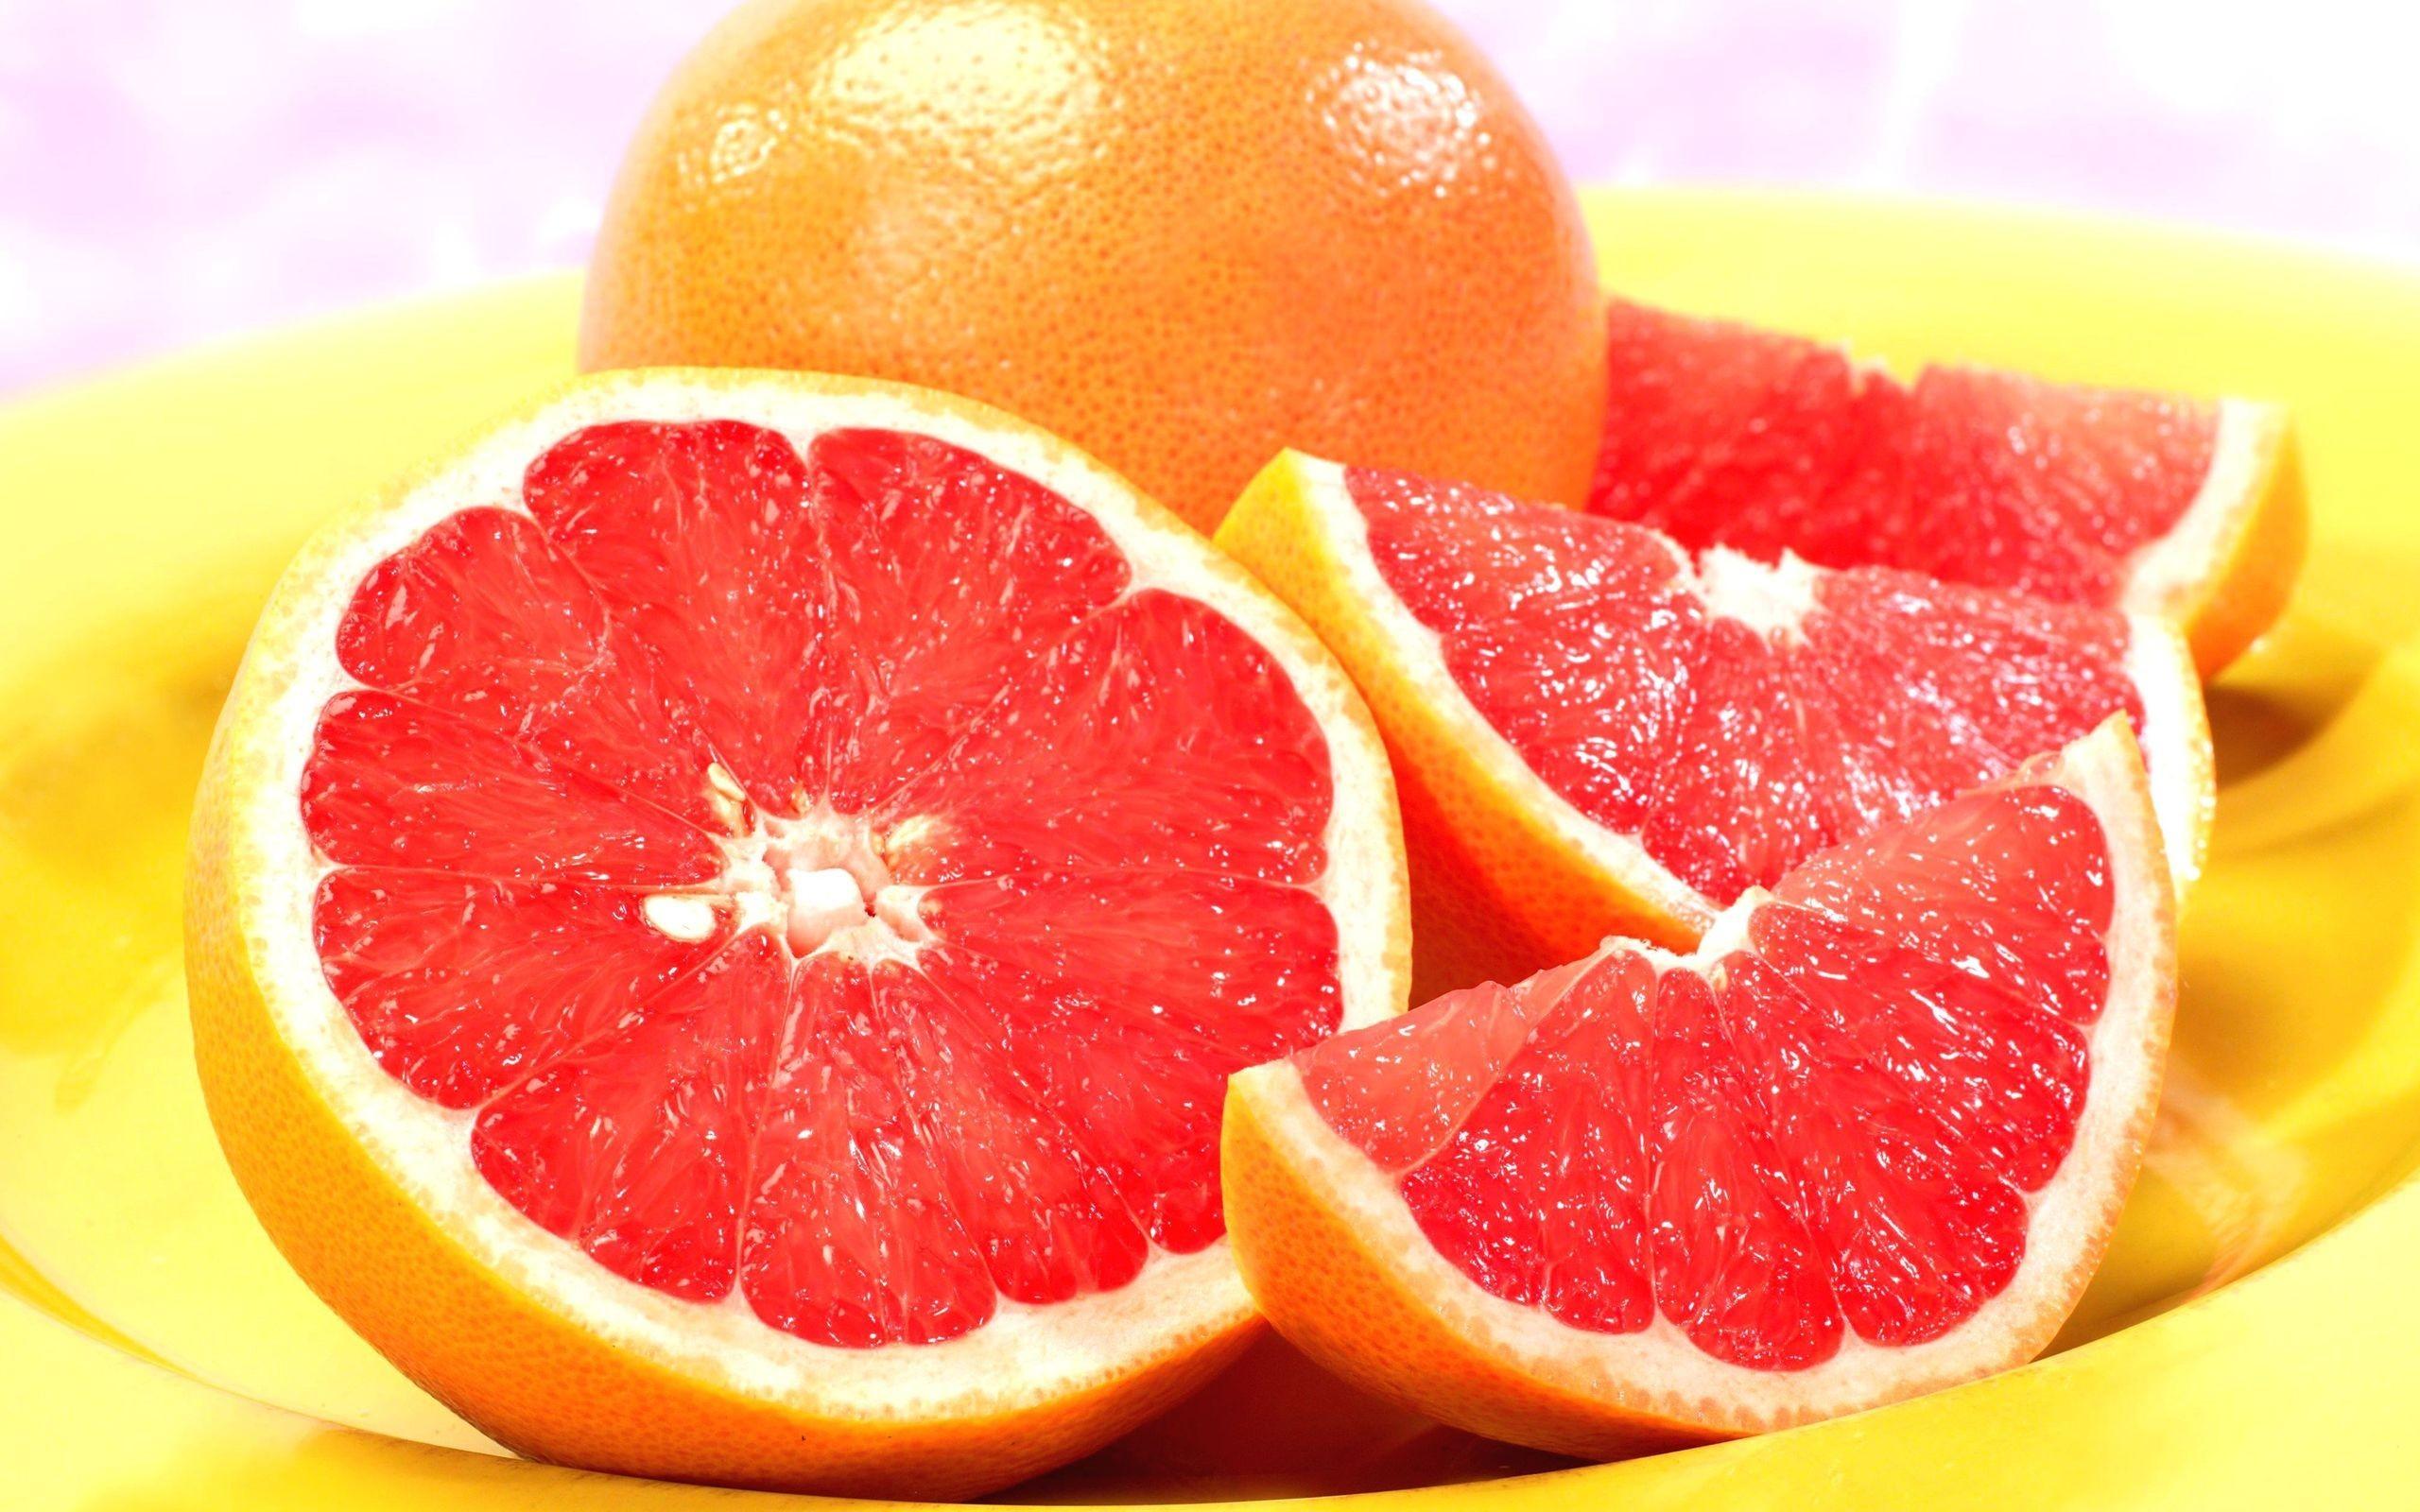 grapefruits fruit food colorful